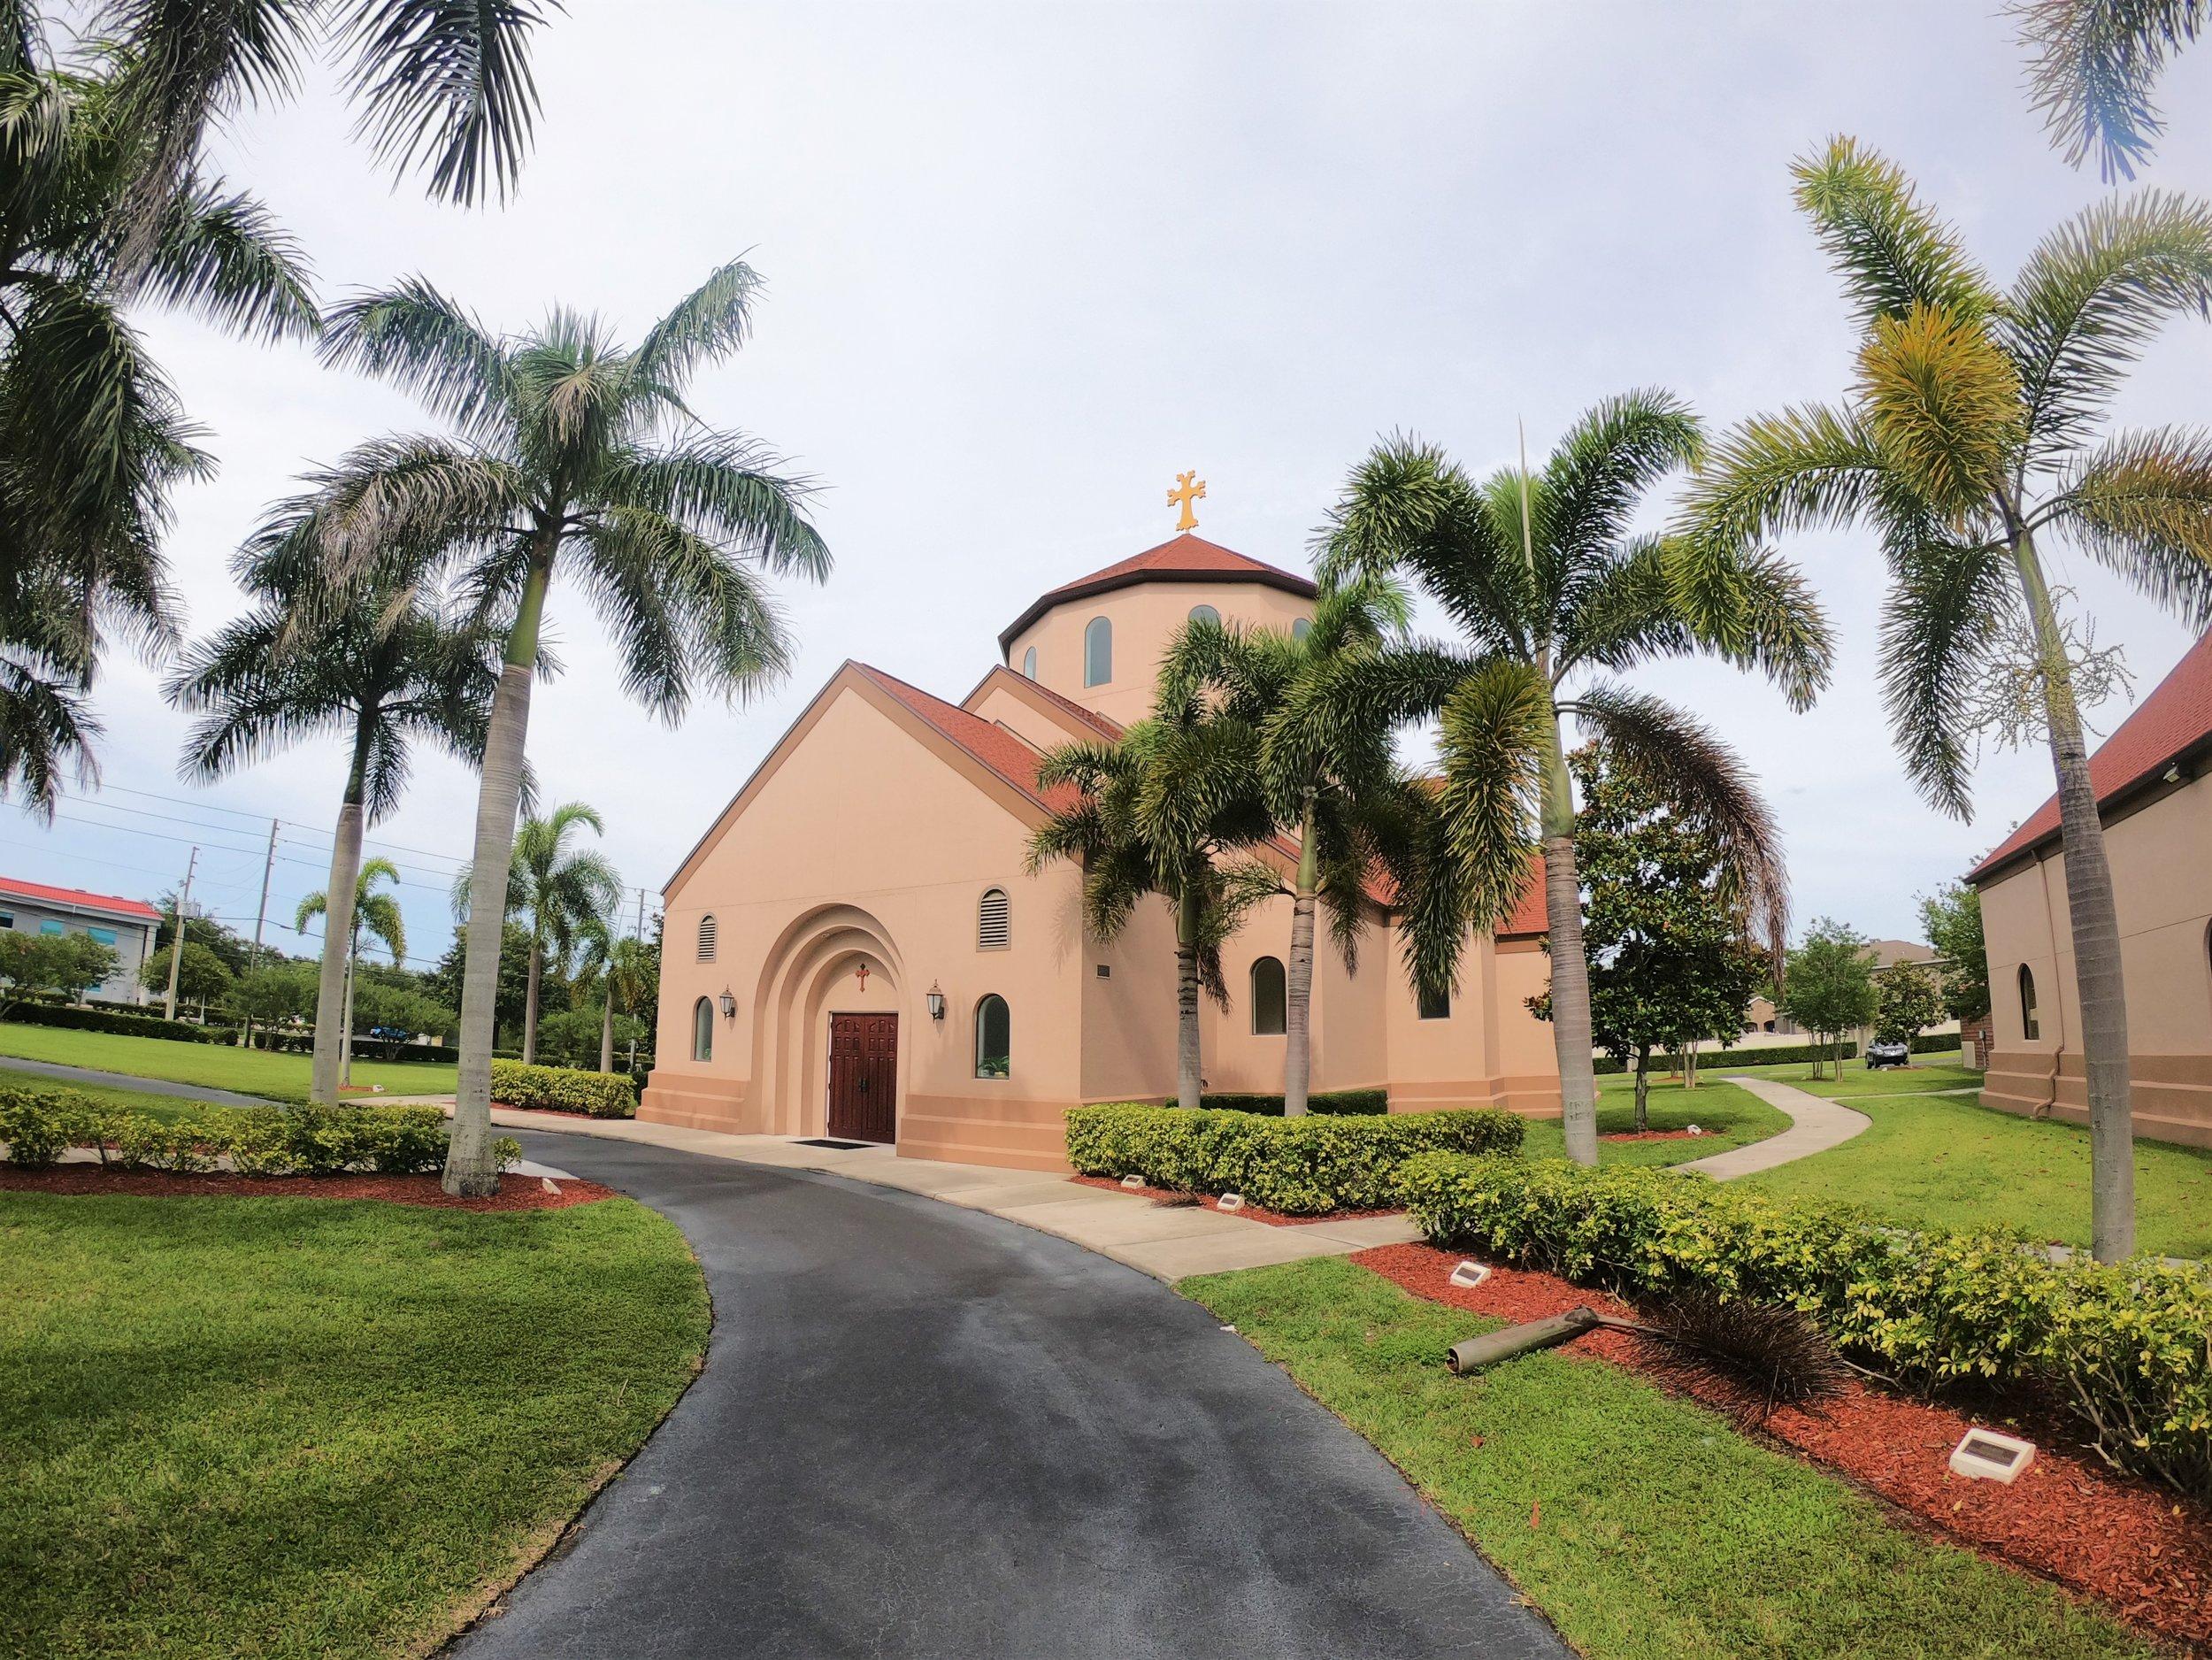 St. Hagop Armenian Church in Pinellas Park, Fl